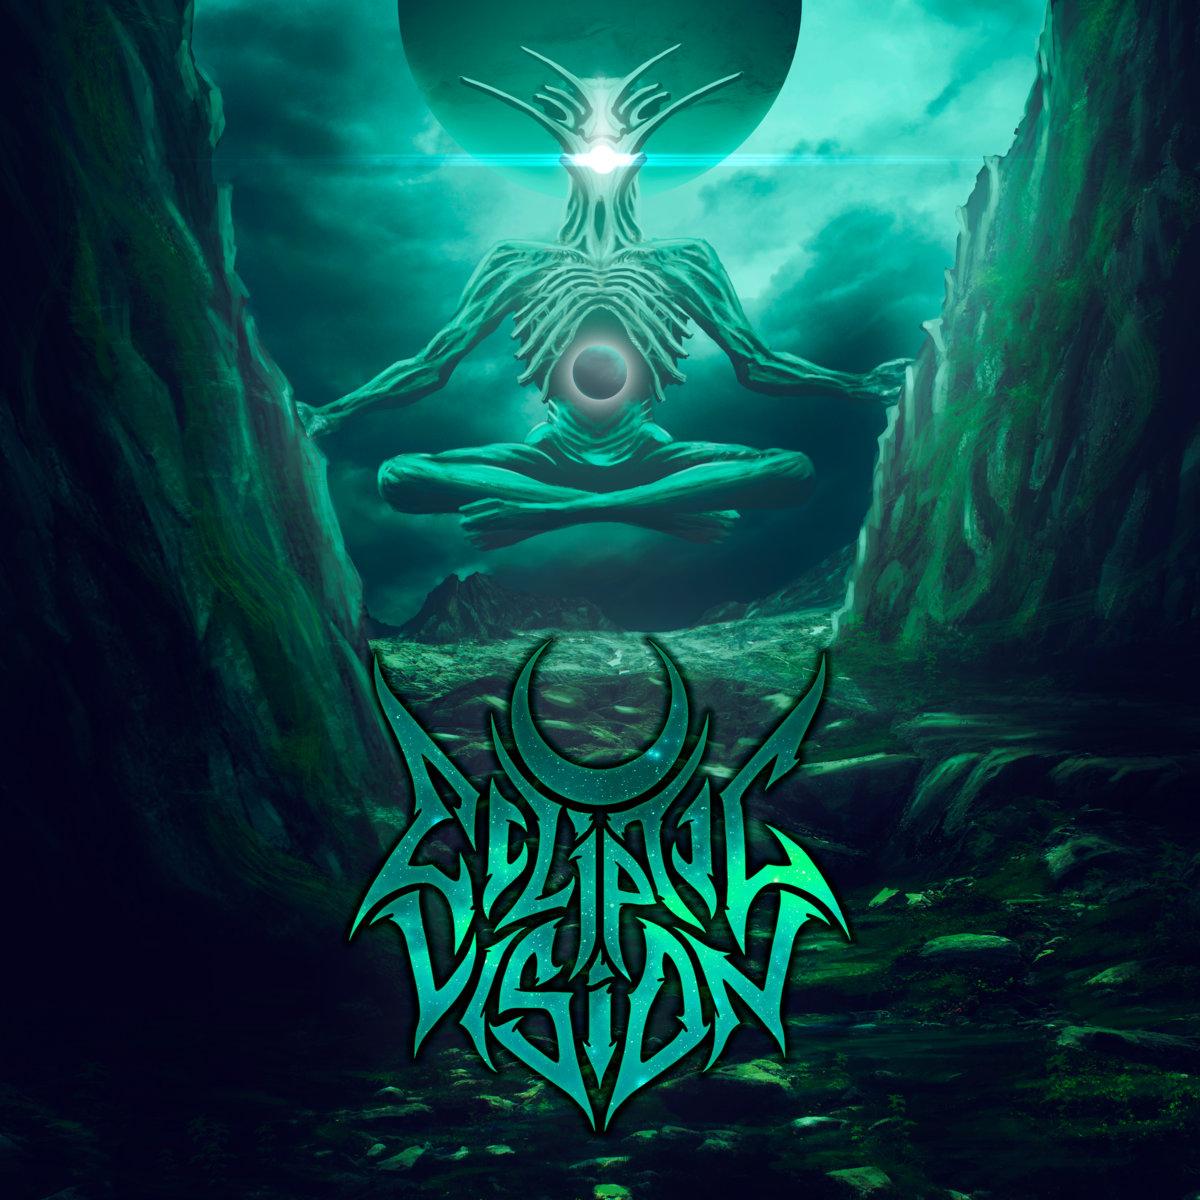 ecliptic_vision_cover_art.jpg